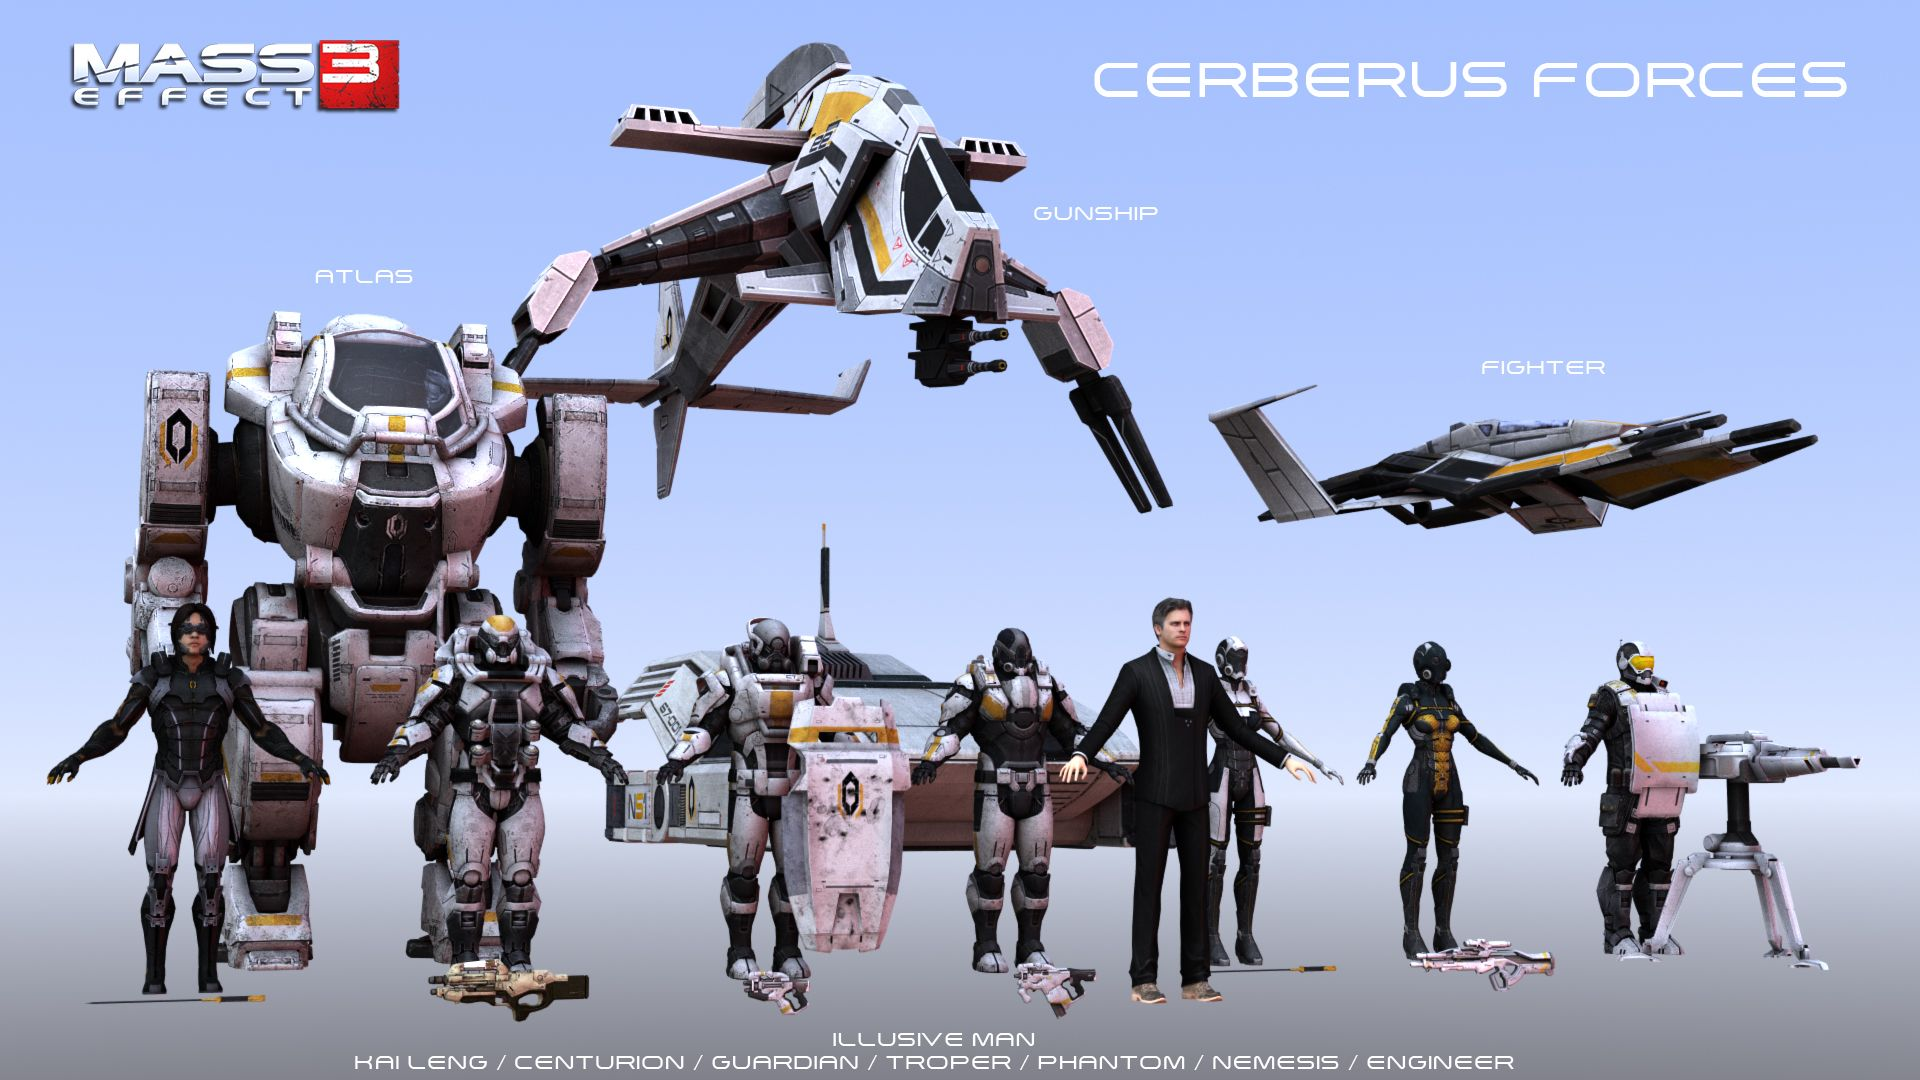 Mass Effect 3 Vehicles: Mass Effect, Mass Effect 3, Hd